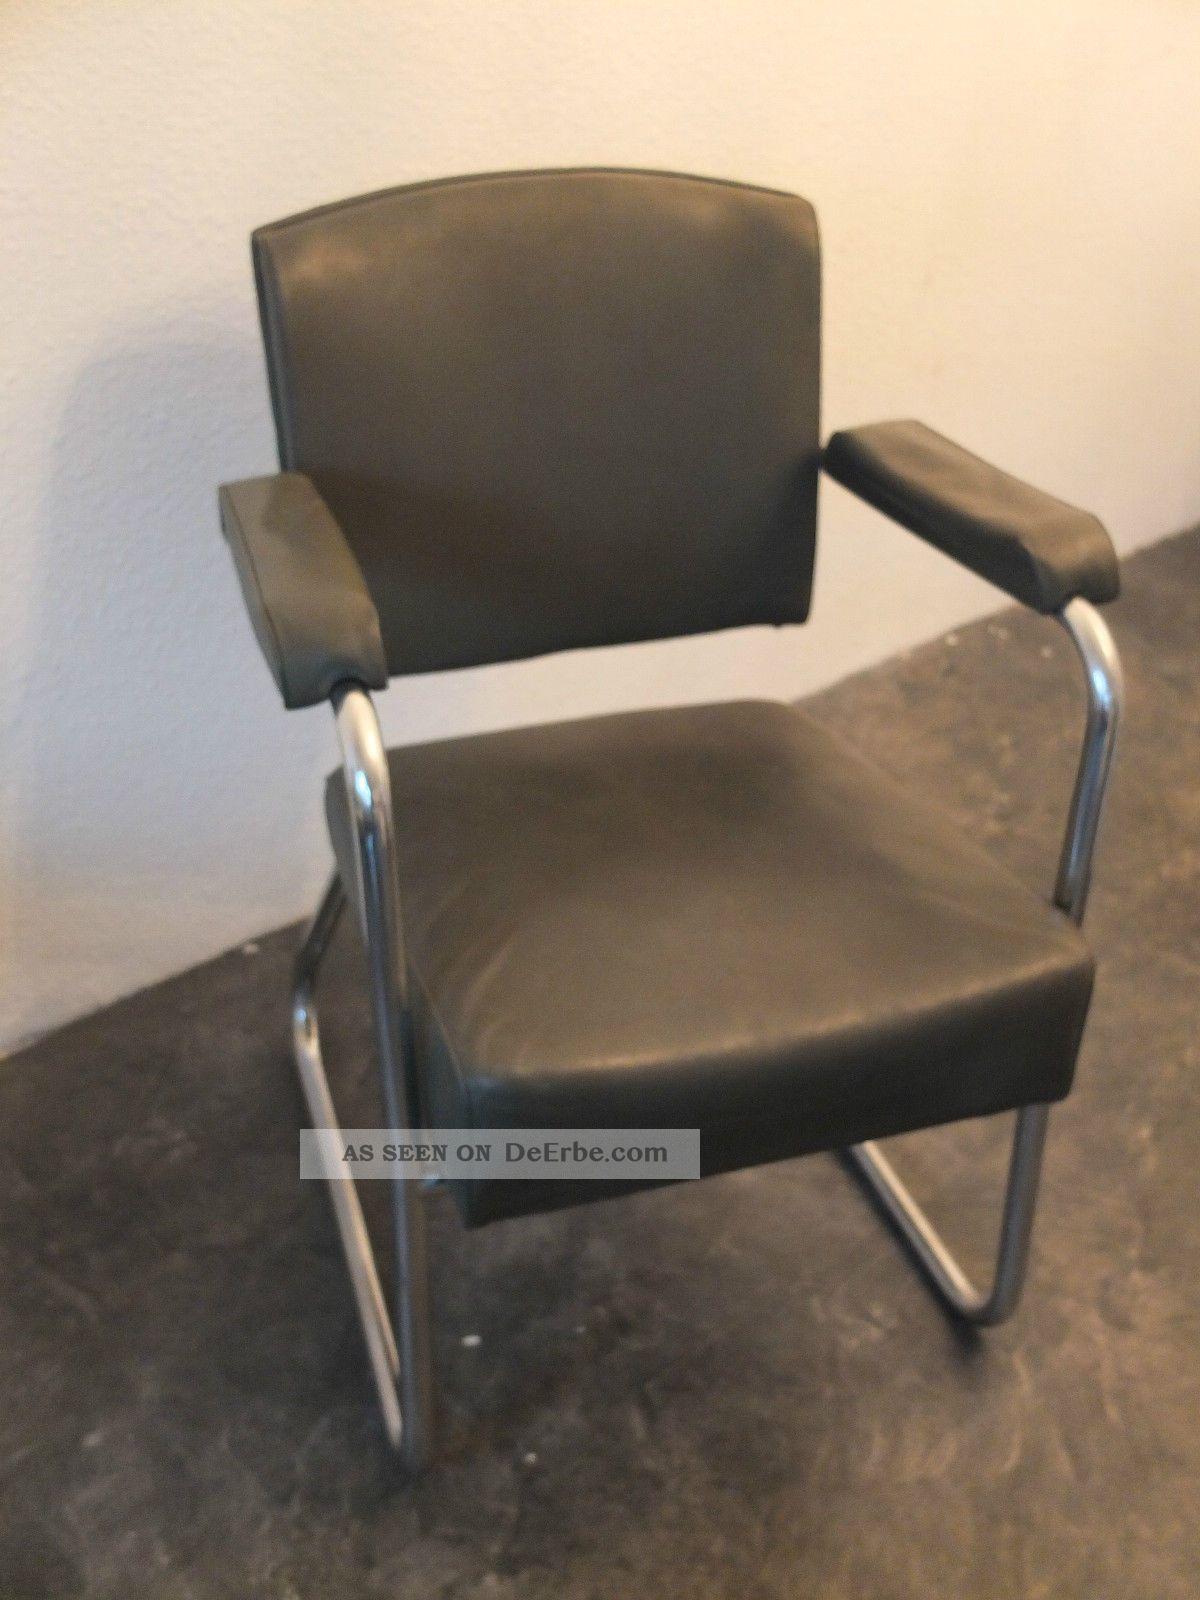 bauhaus stuhl freischwinger chrom sessel gr n thonet mauser baisch. Black Bedroom Furniture Sets. Home Design Ideas